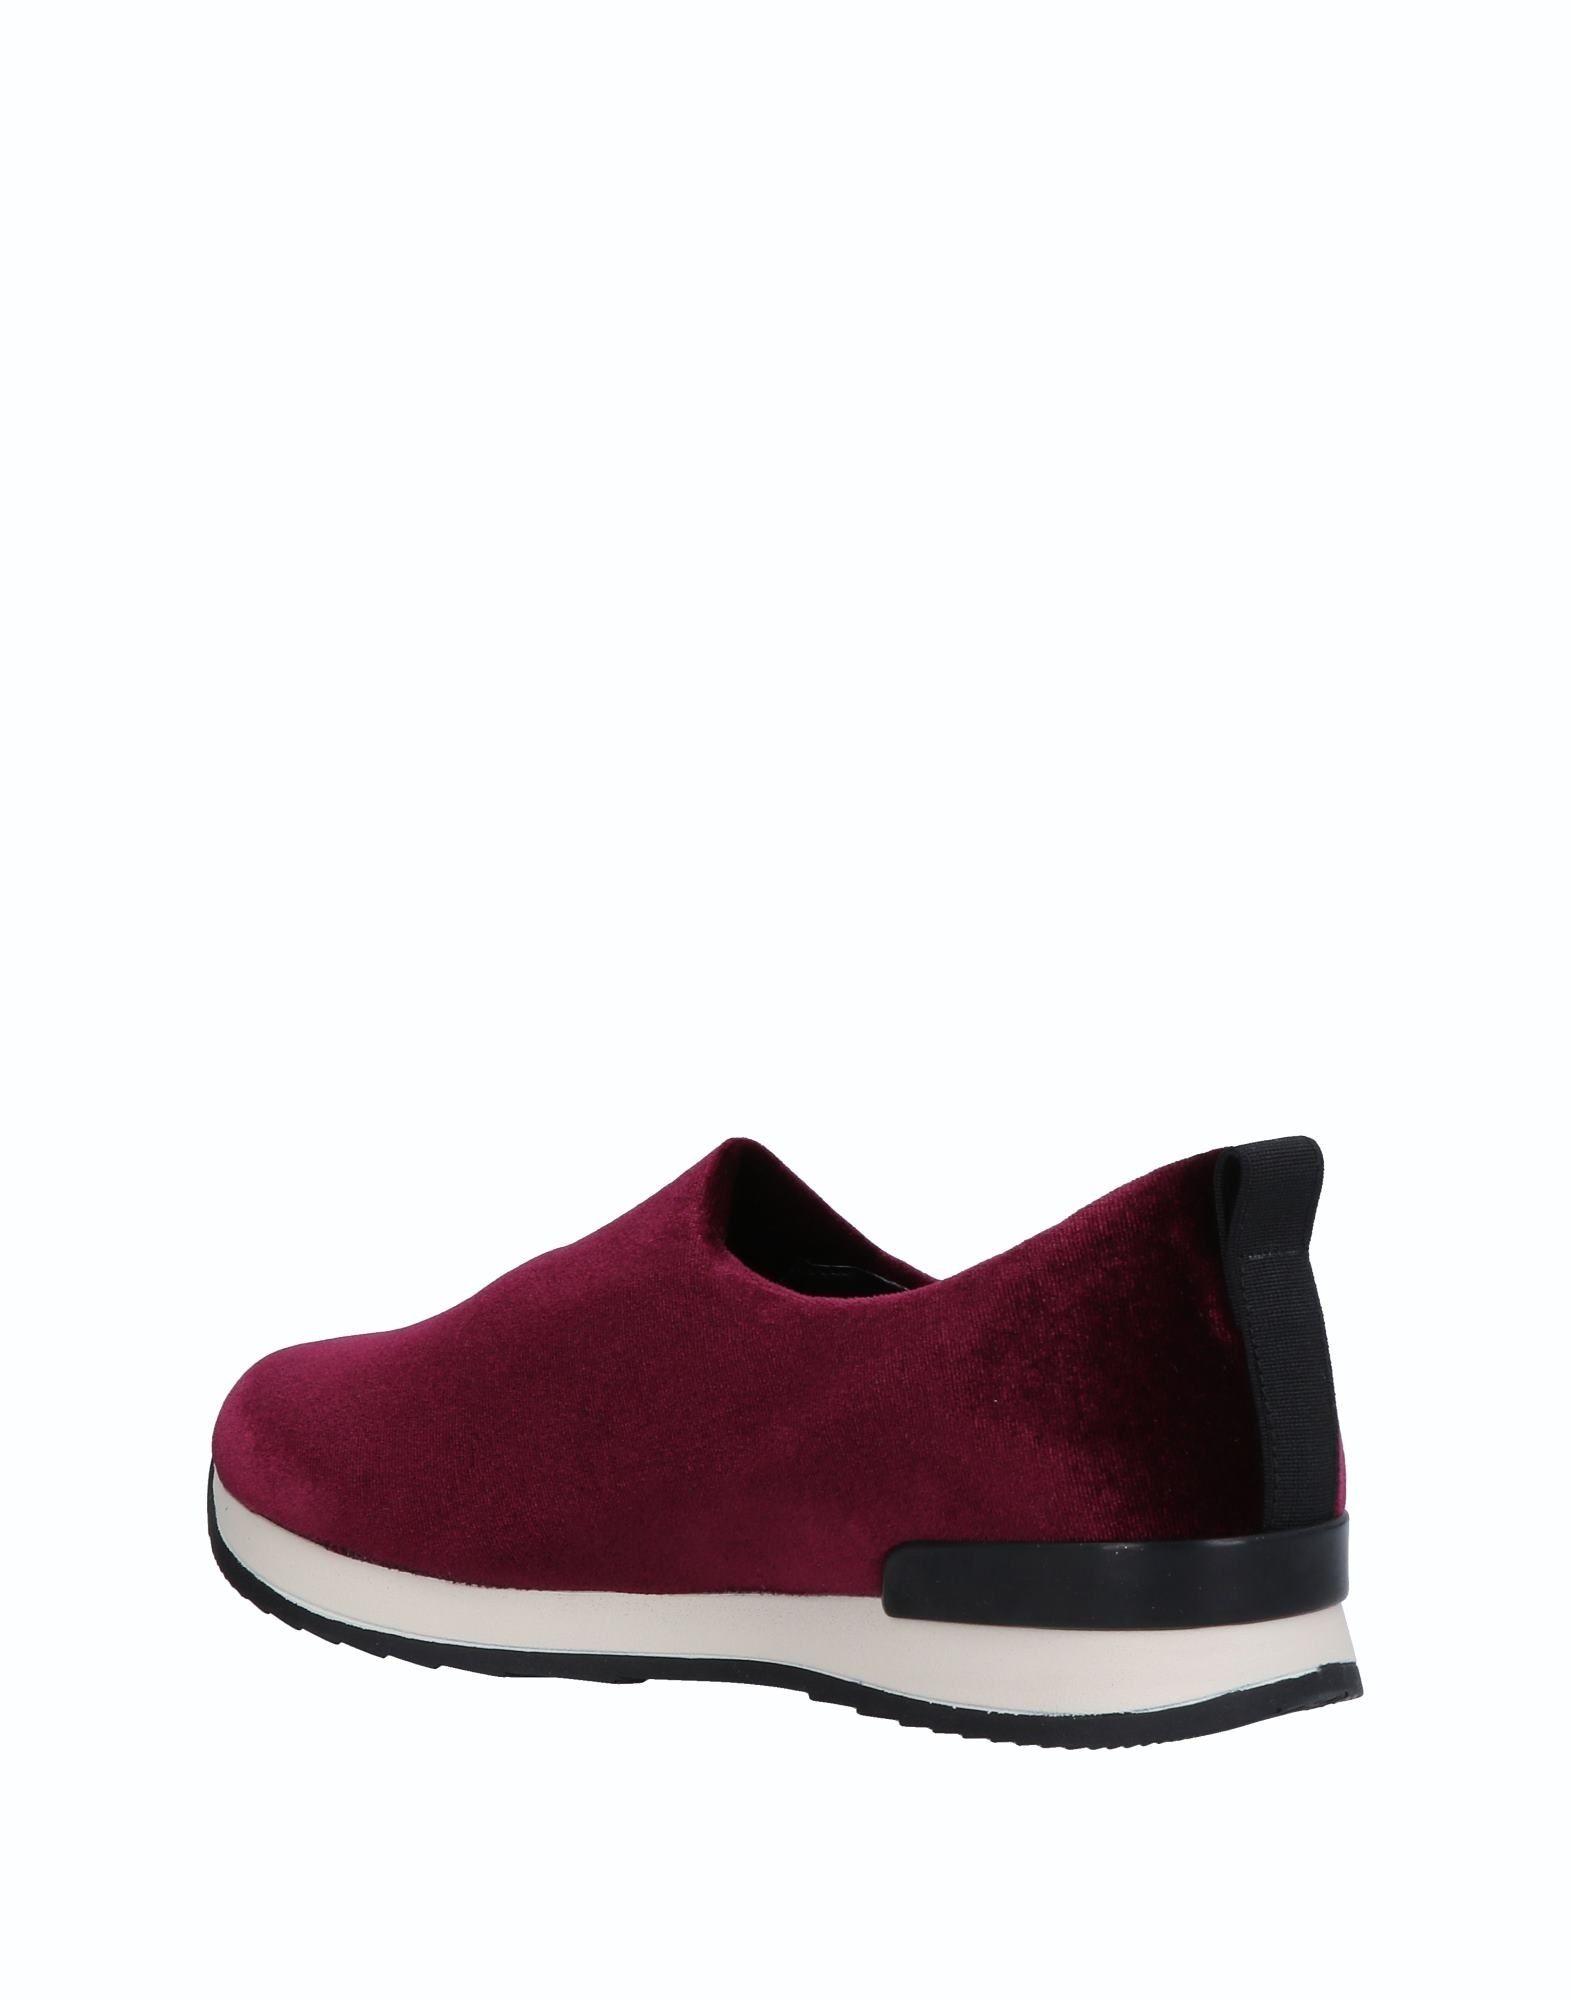 Gut Rapisardi um billige Schuhe zu tragenNr Rapisardi Gut Sneakers Damen  11504915VJ 676a52